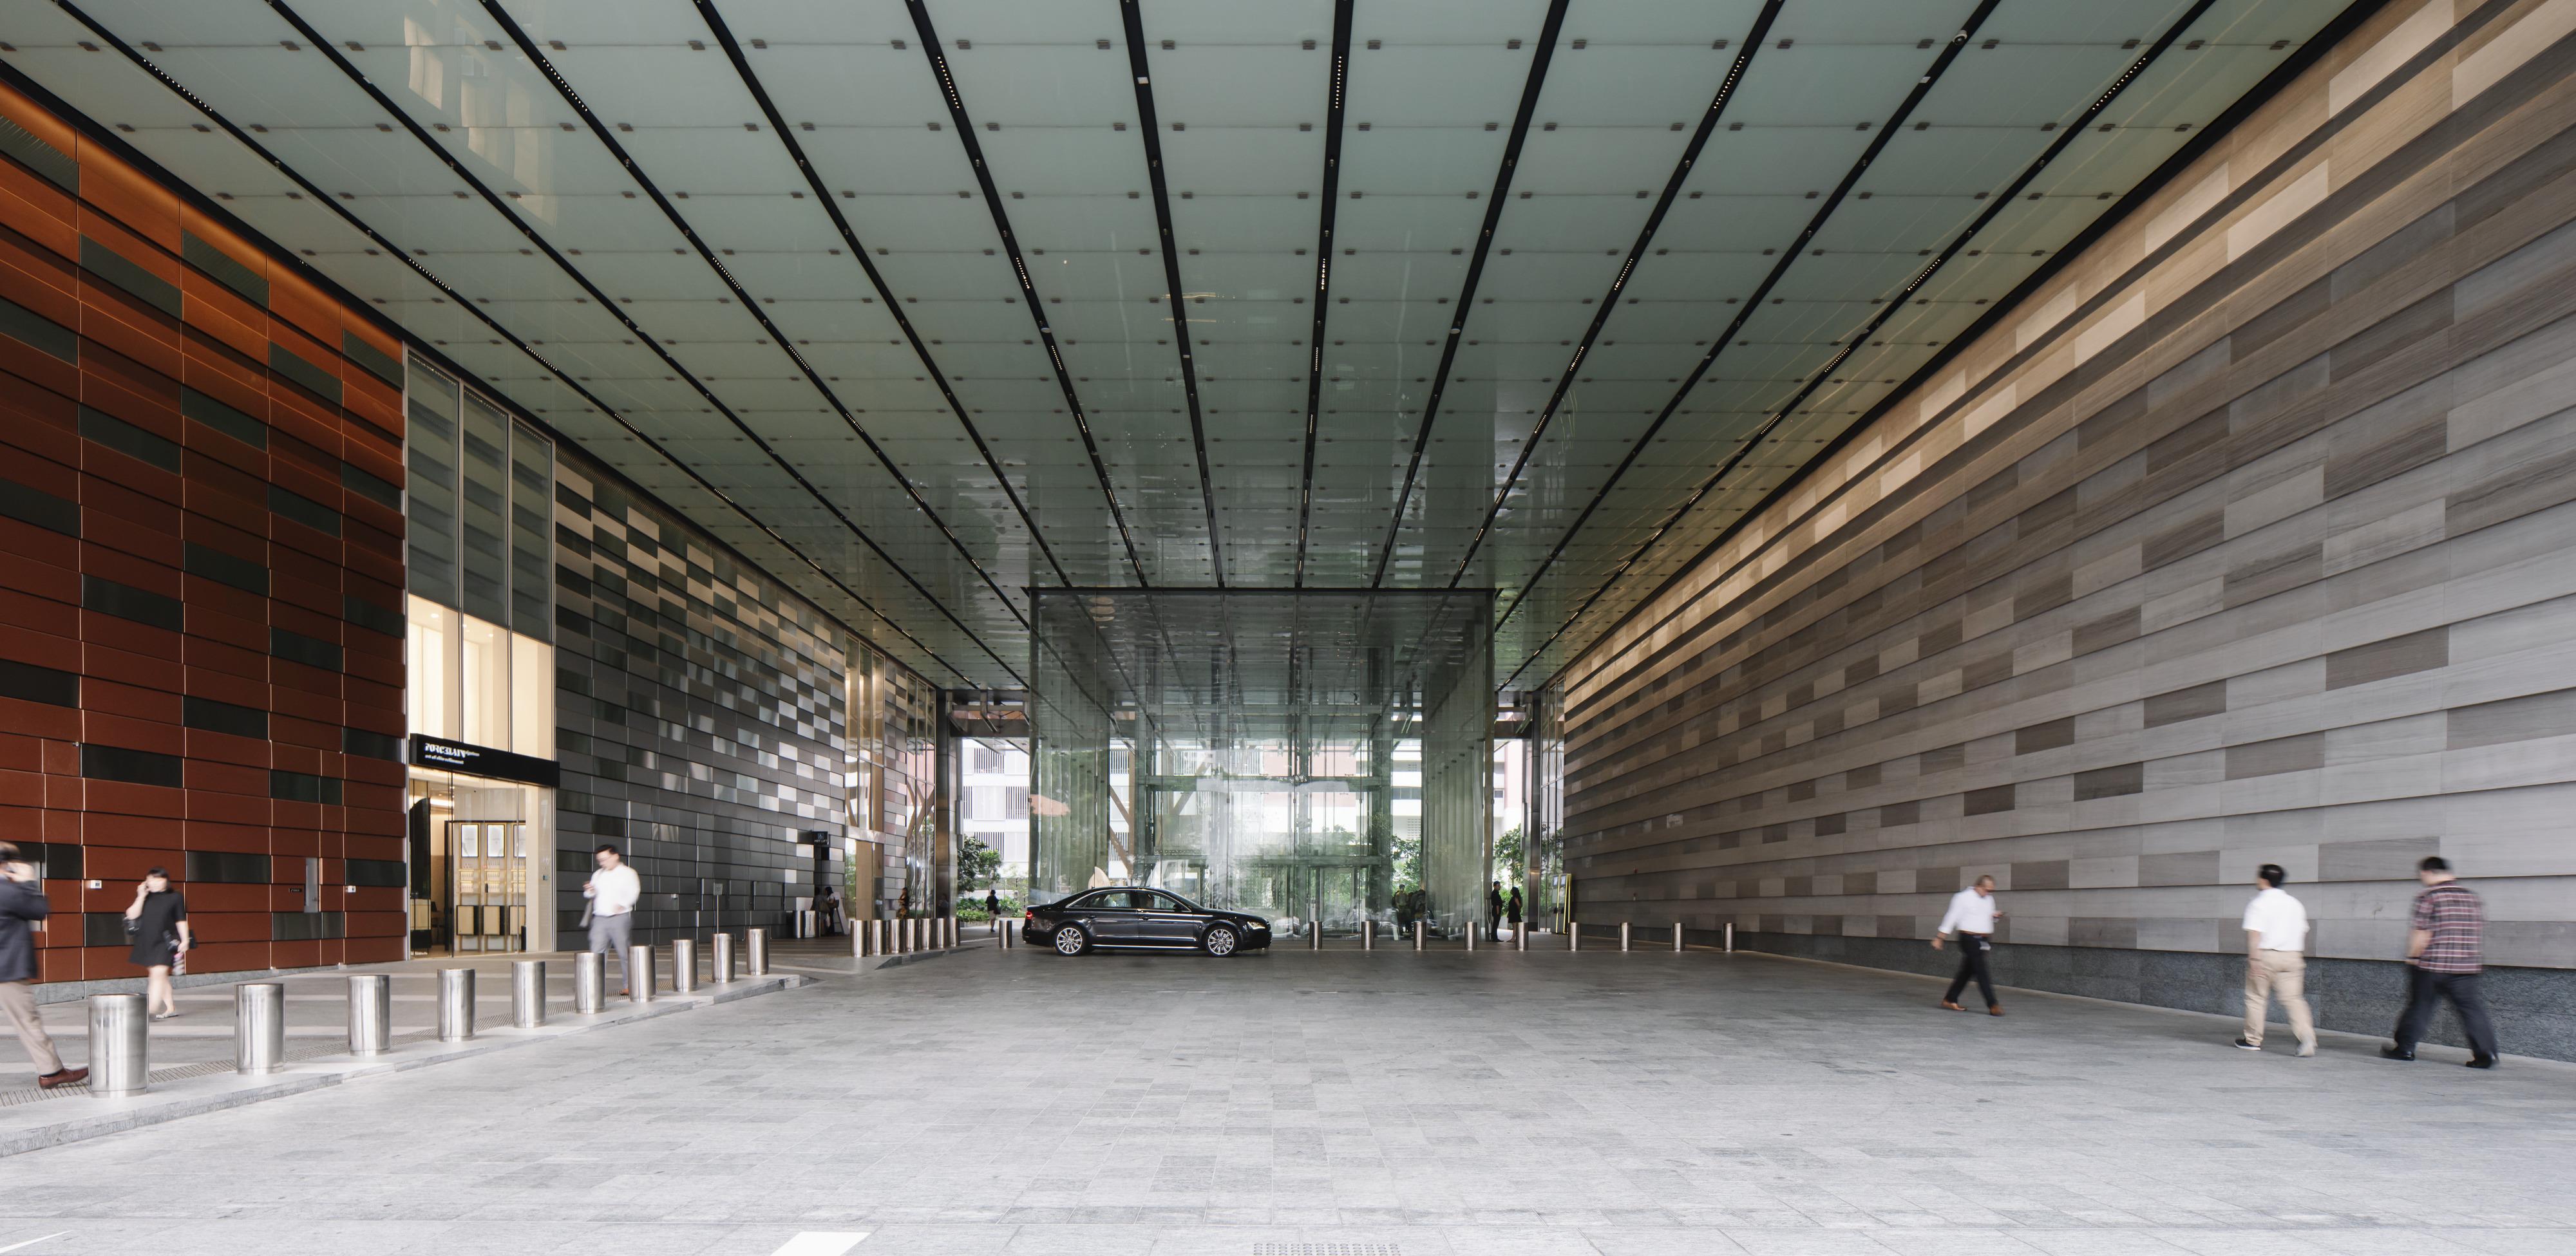 Slide 11 of 12, Guoco Tower